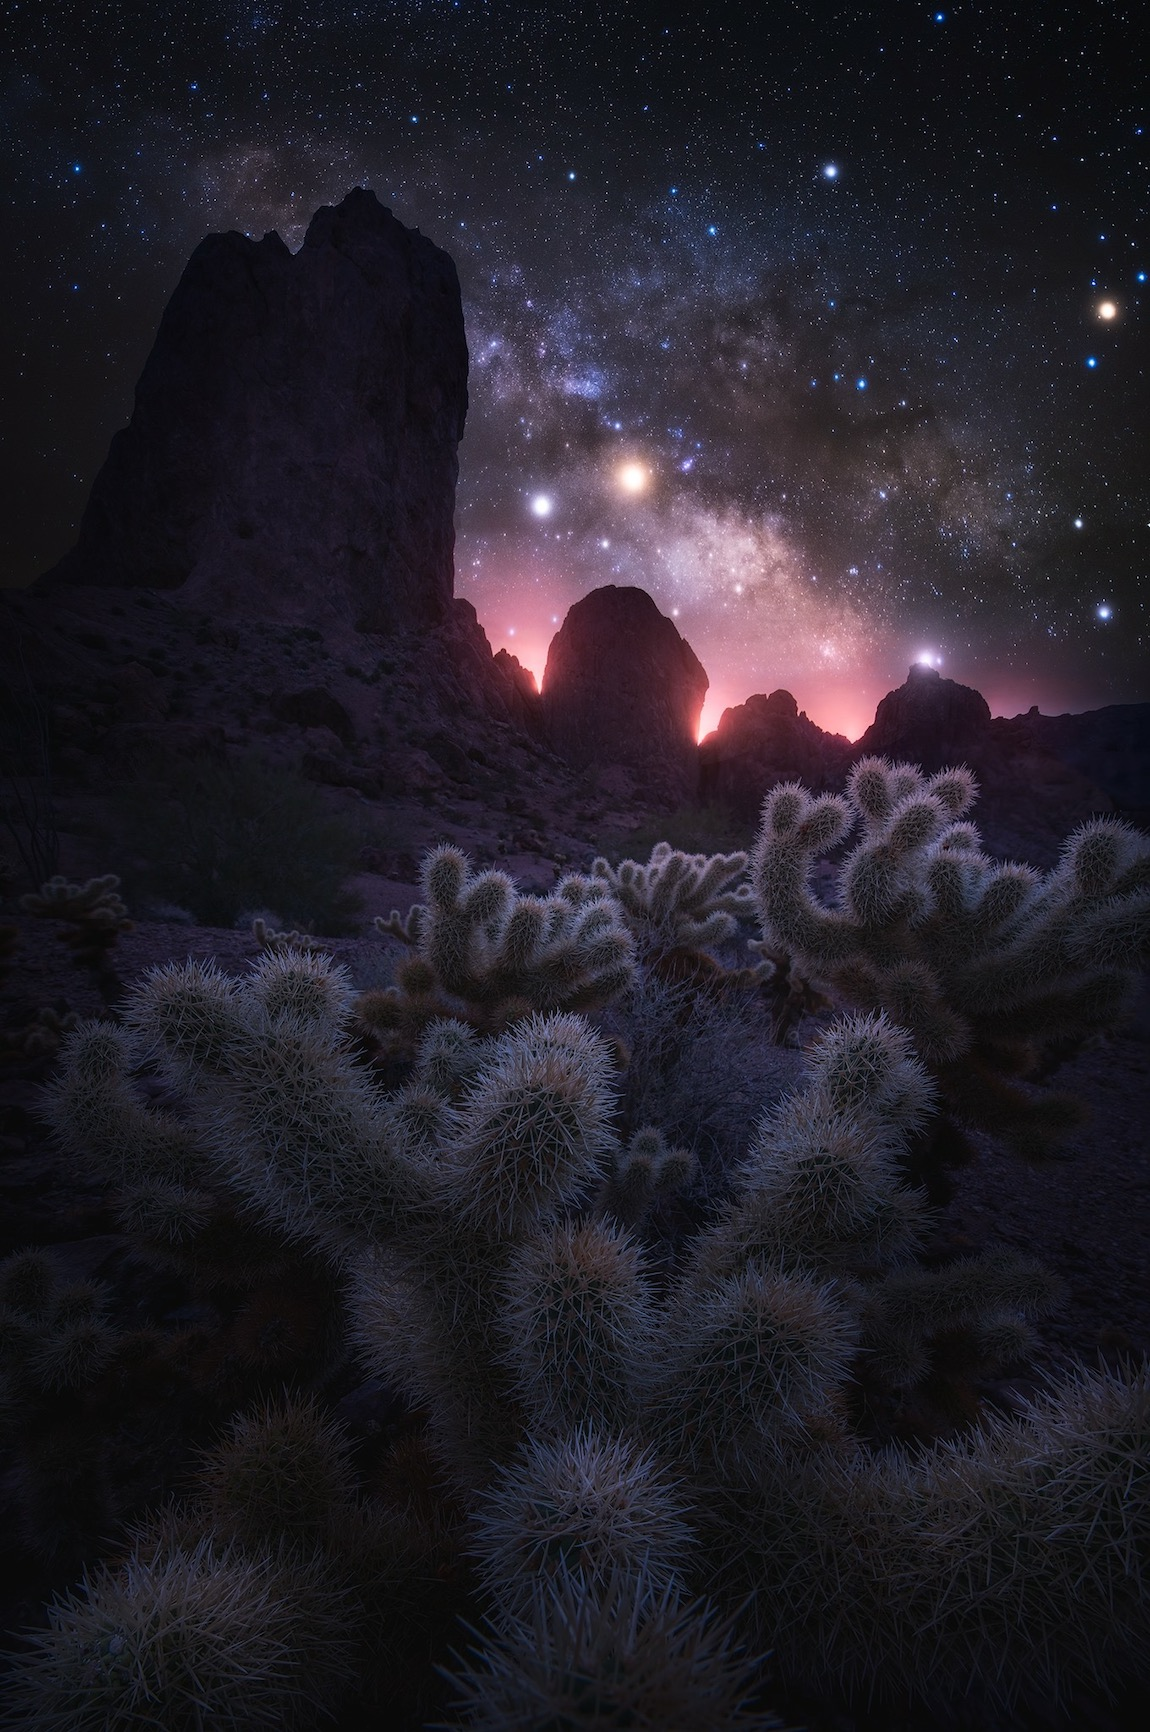 night-landscape-photography-12